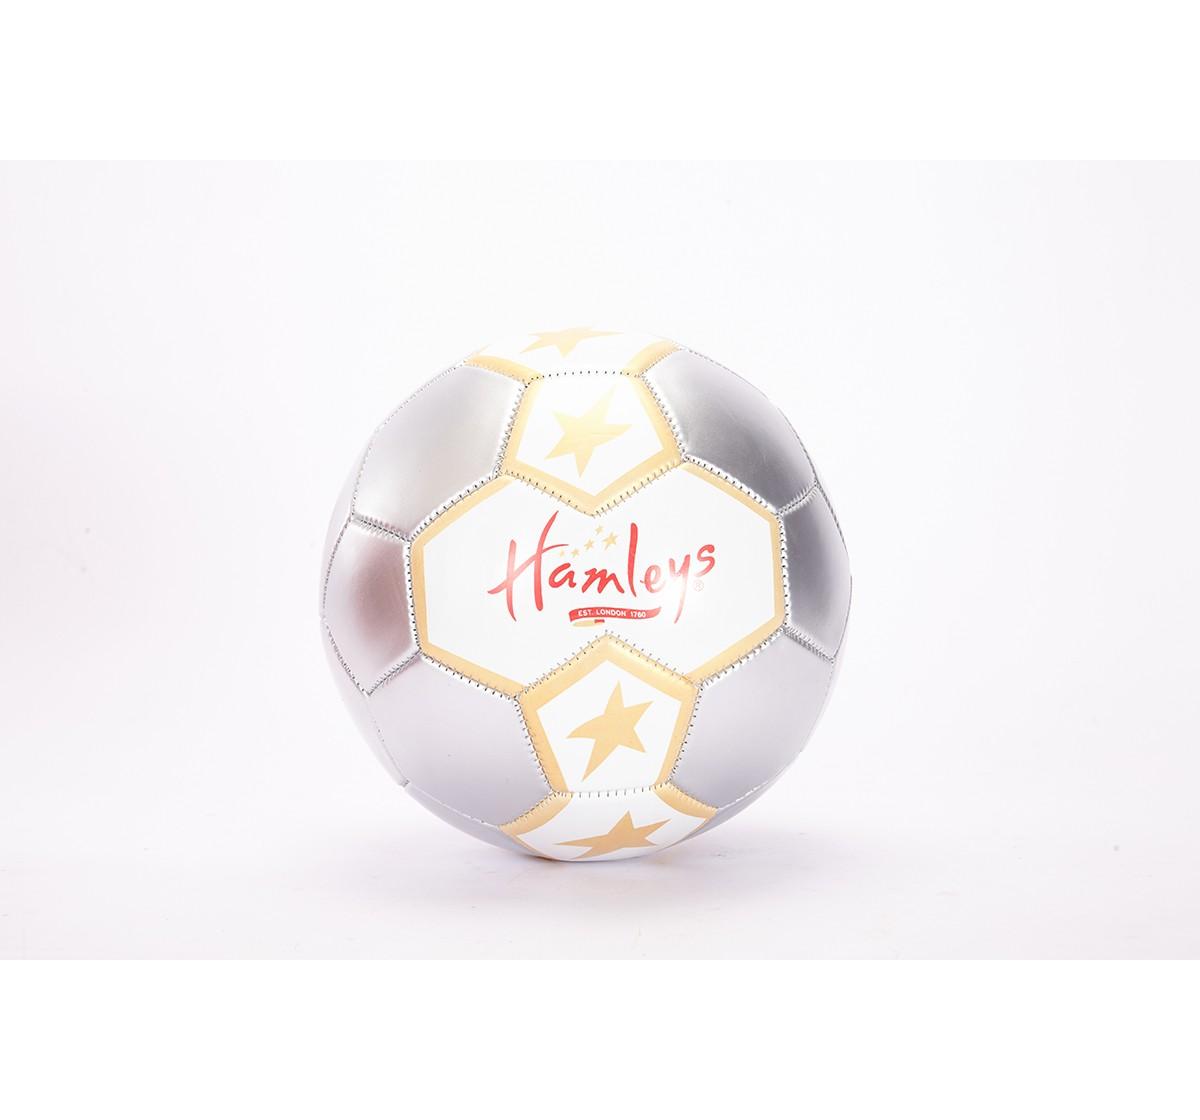 Hamleys Star Metallic Football for Kids age 3Y+ (Grey)